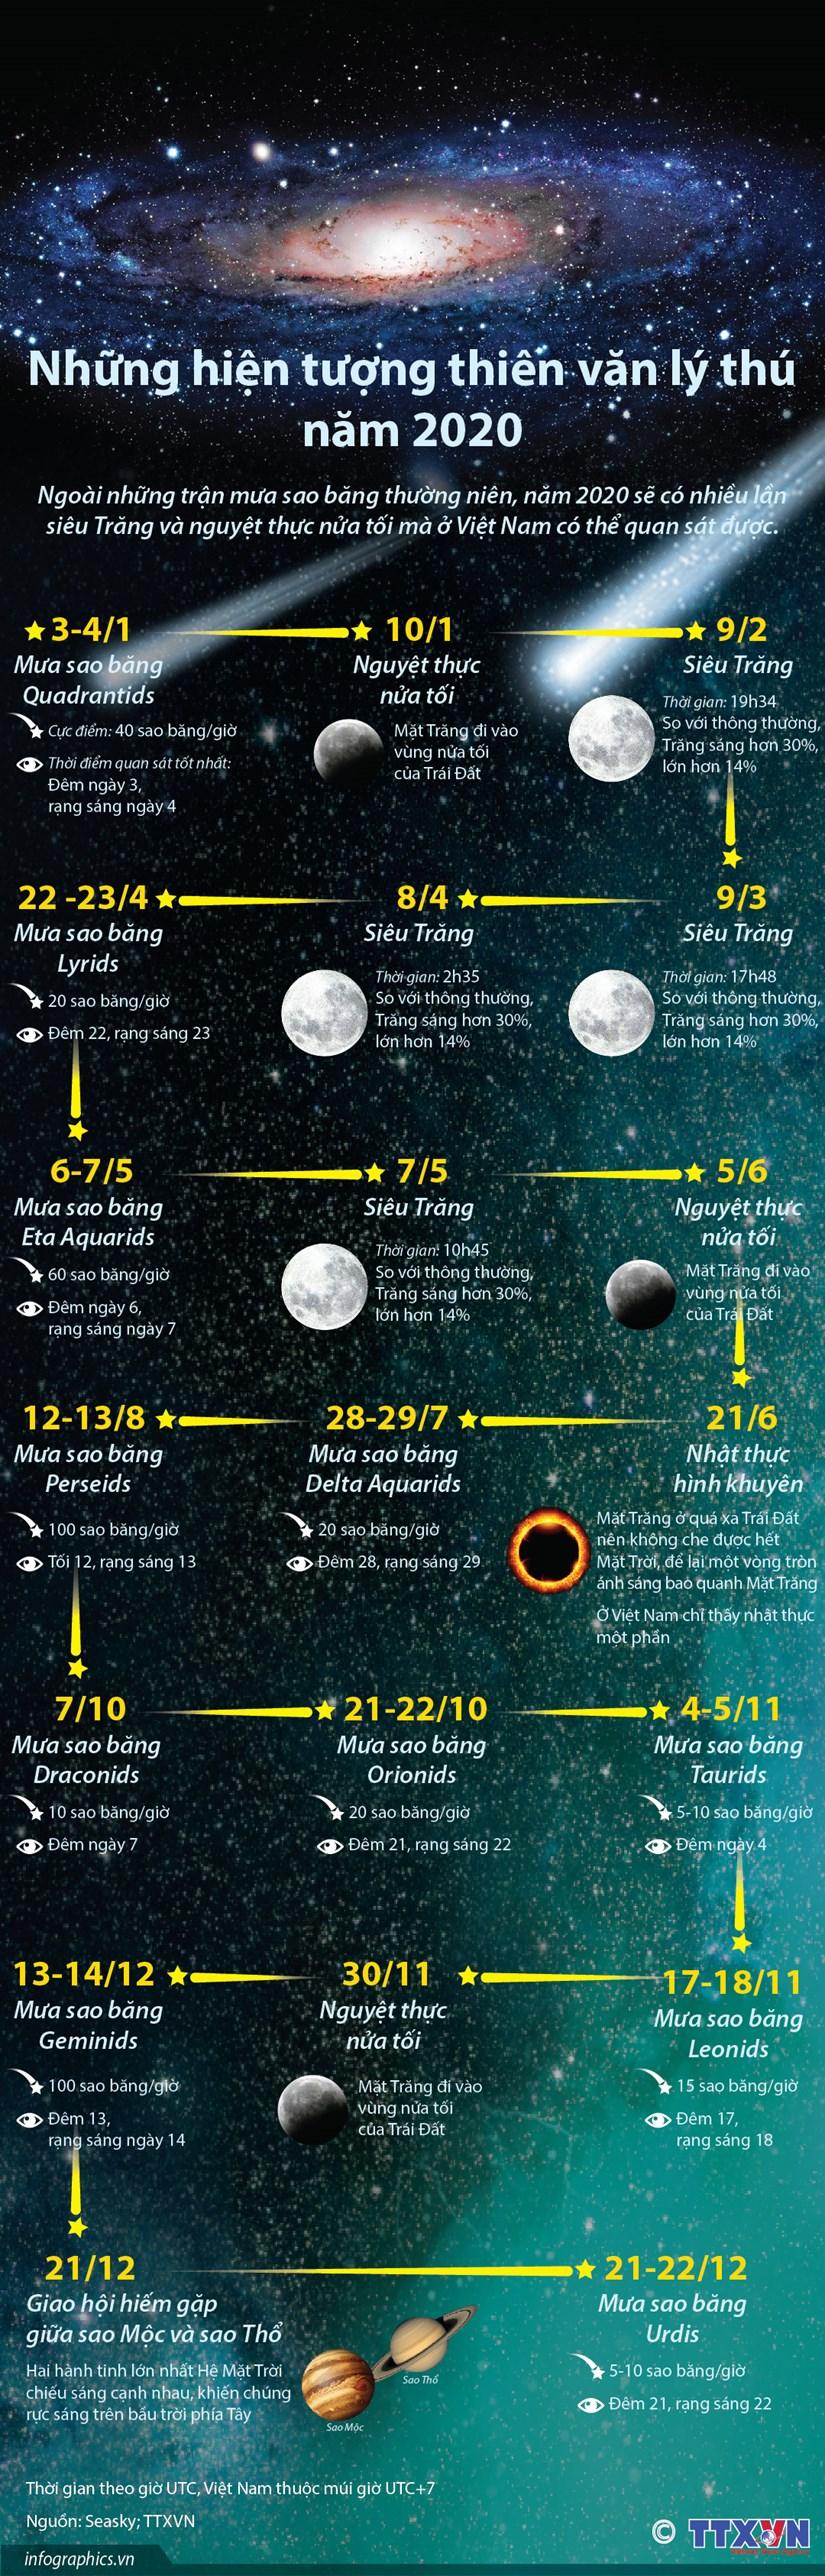 [Infographics] Nhung hien tuong thien van ly thu trong nam 2020 hinh anh 1